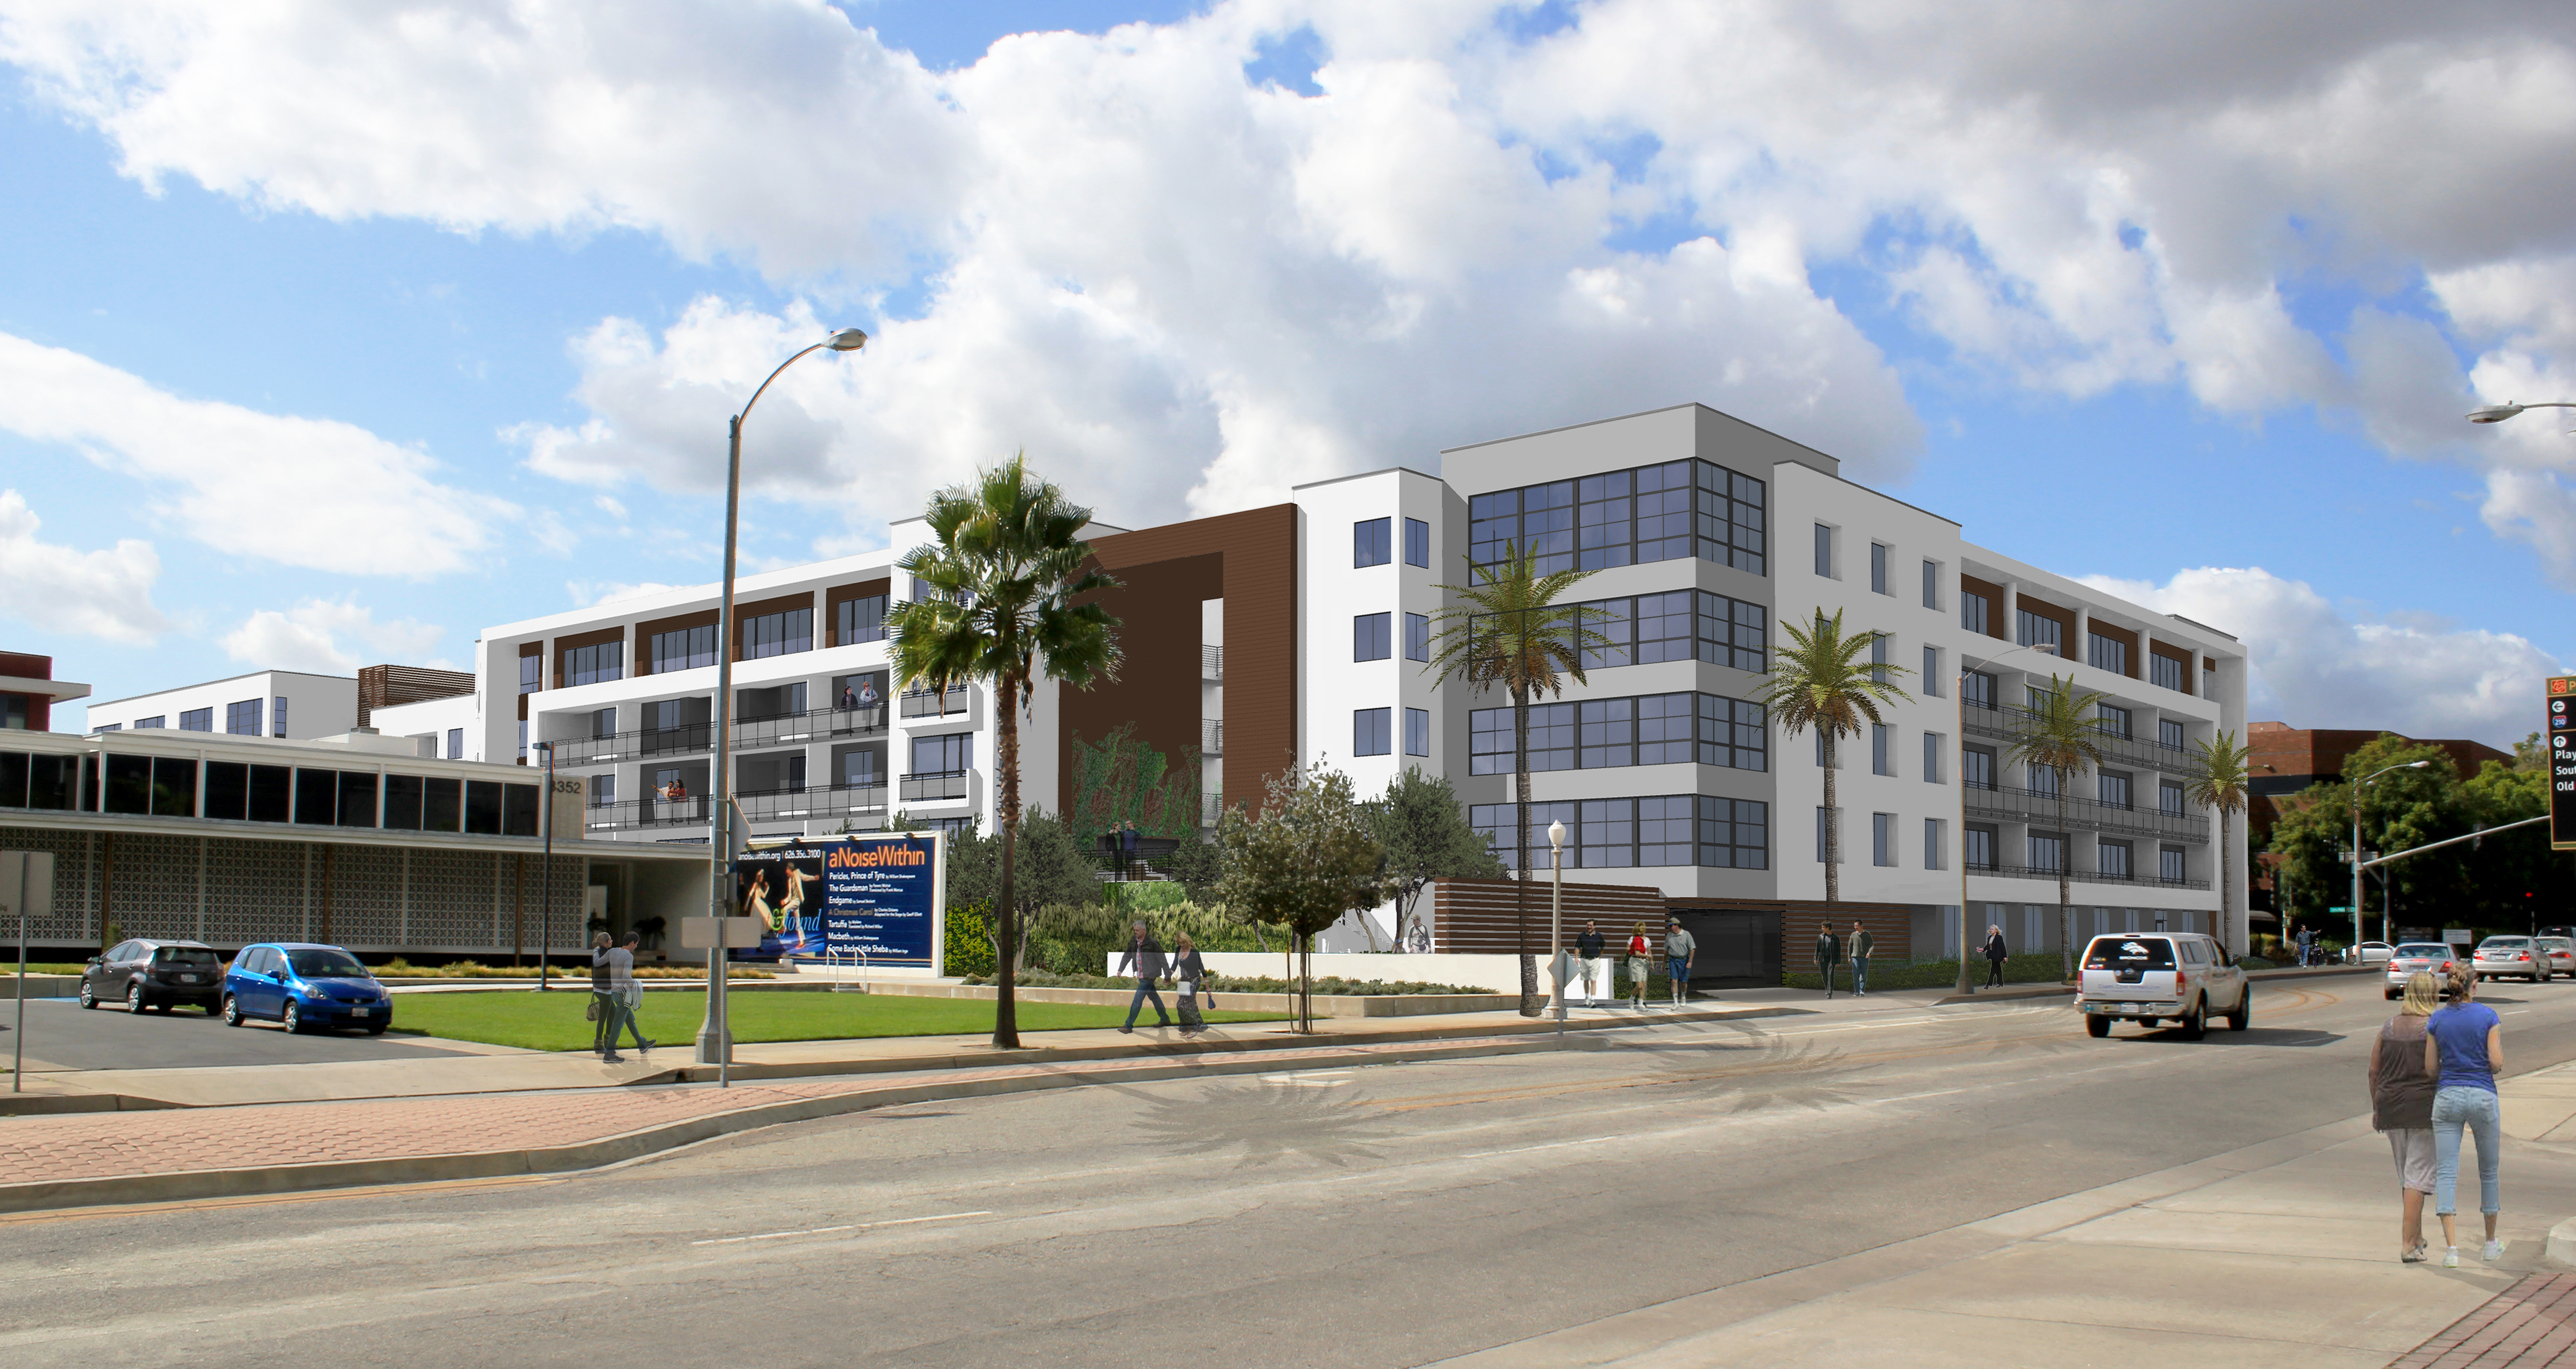 Ellington - The Ellington will offer residents a choice of studio, 1-bedroom, 1-bedroom loft and 2-bedroom floor plans